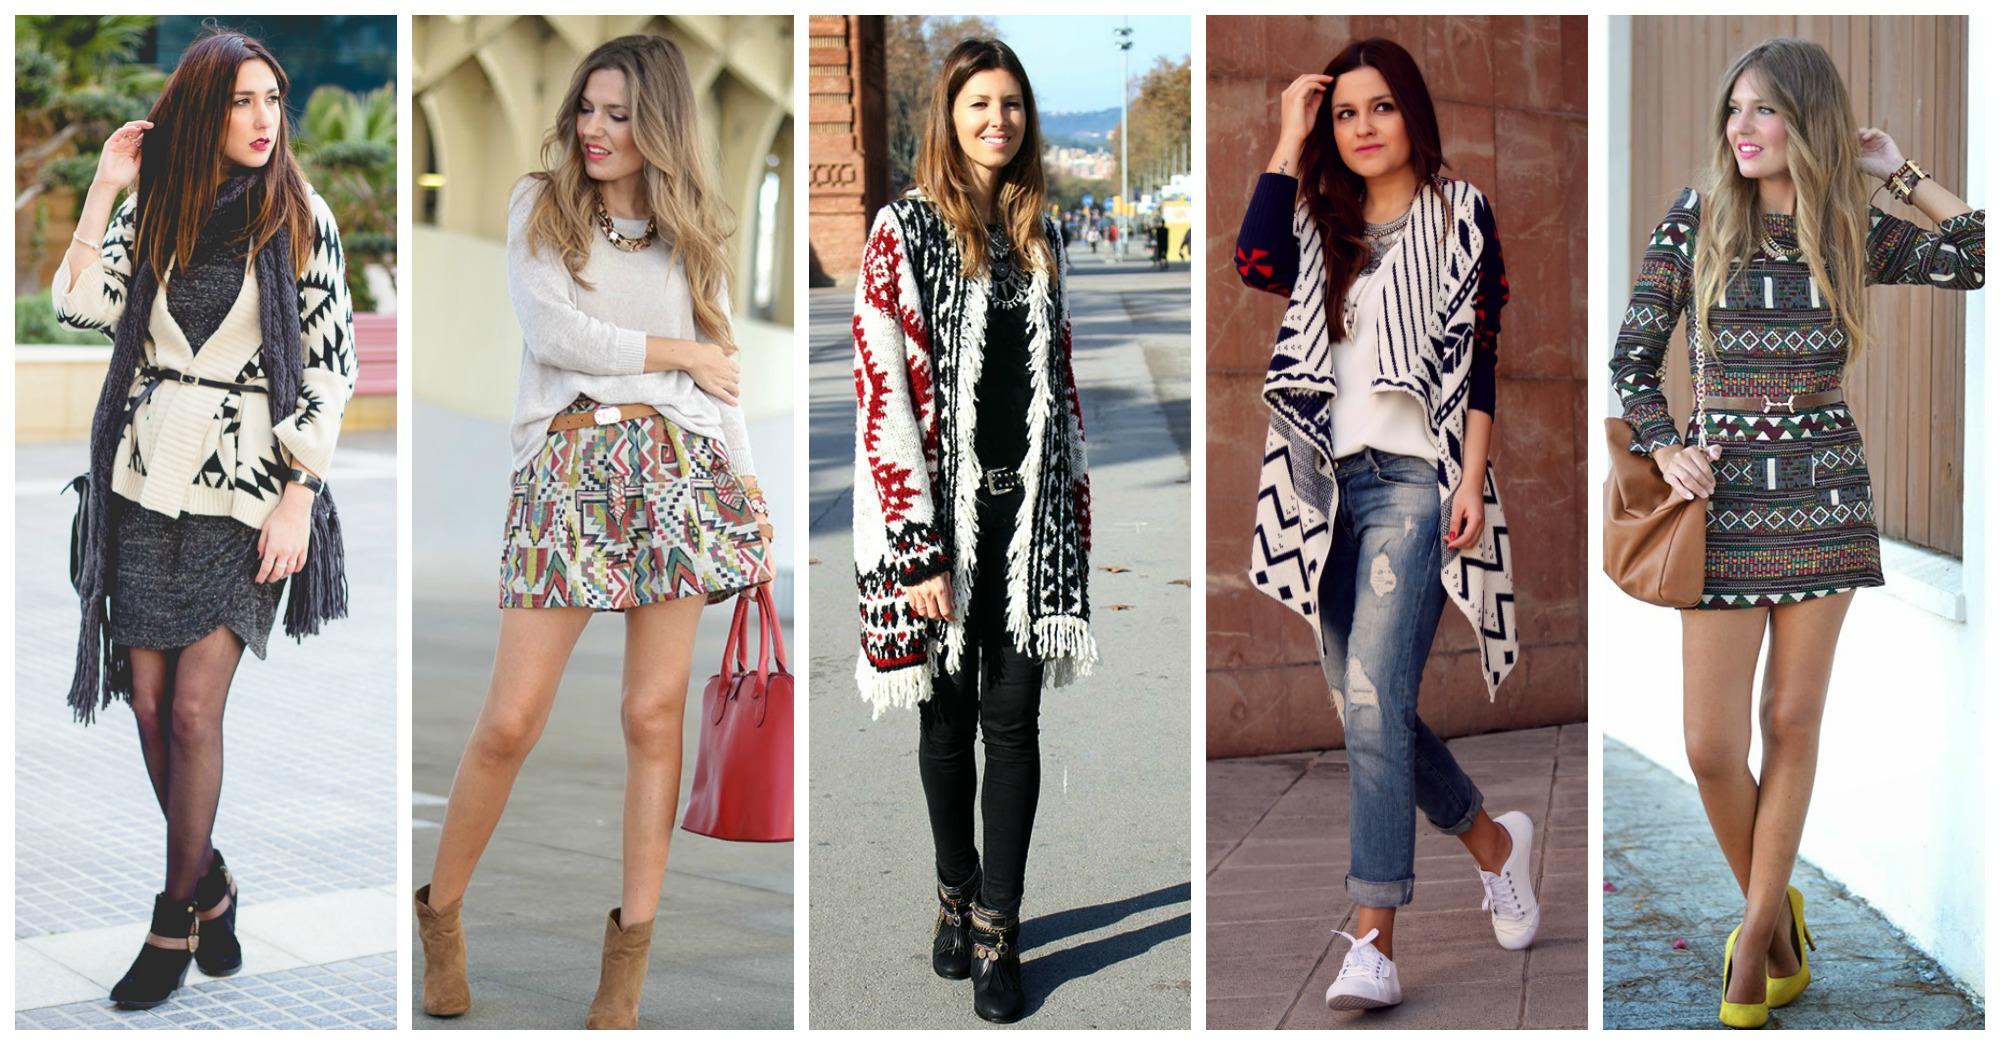 15 Ideas of How to Wear Aztec in Winter